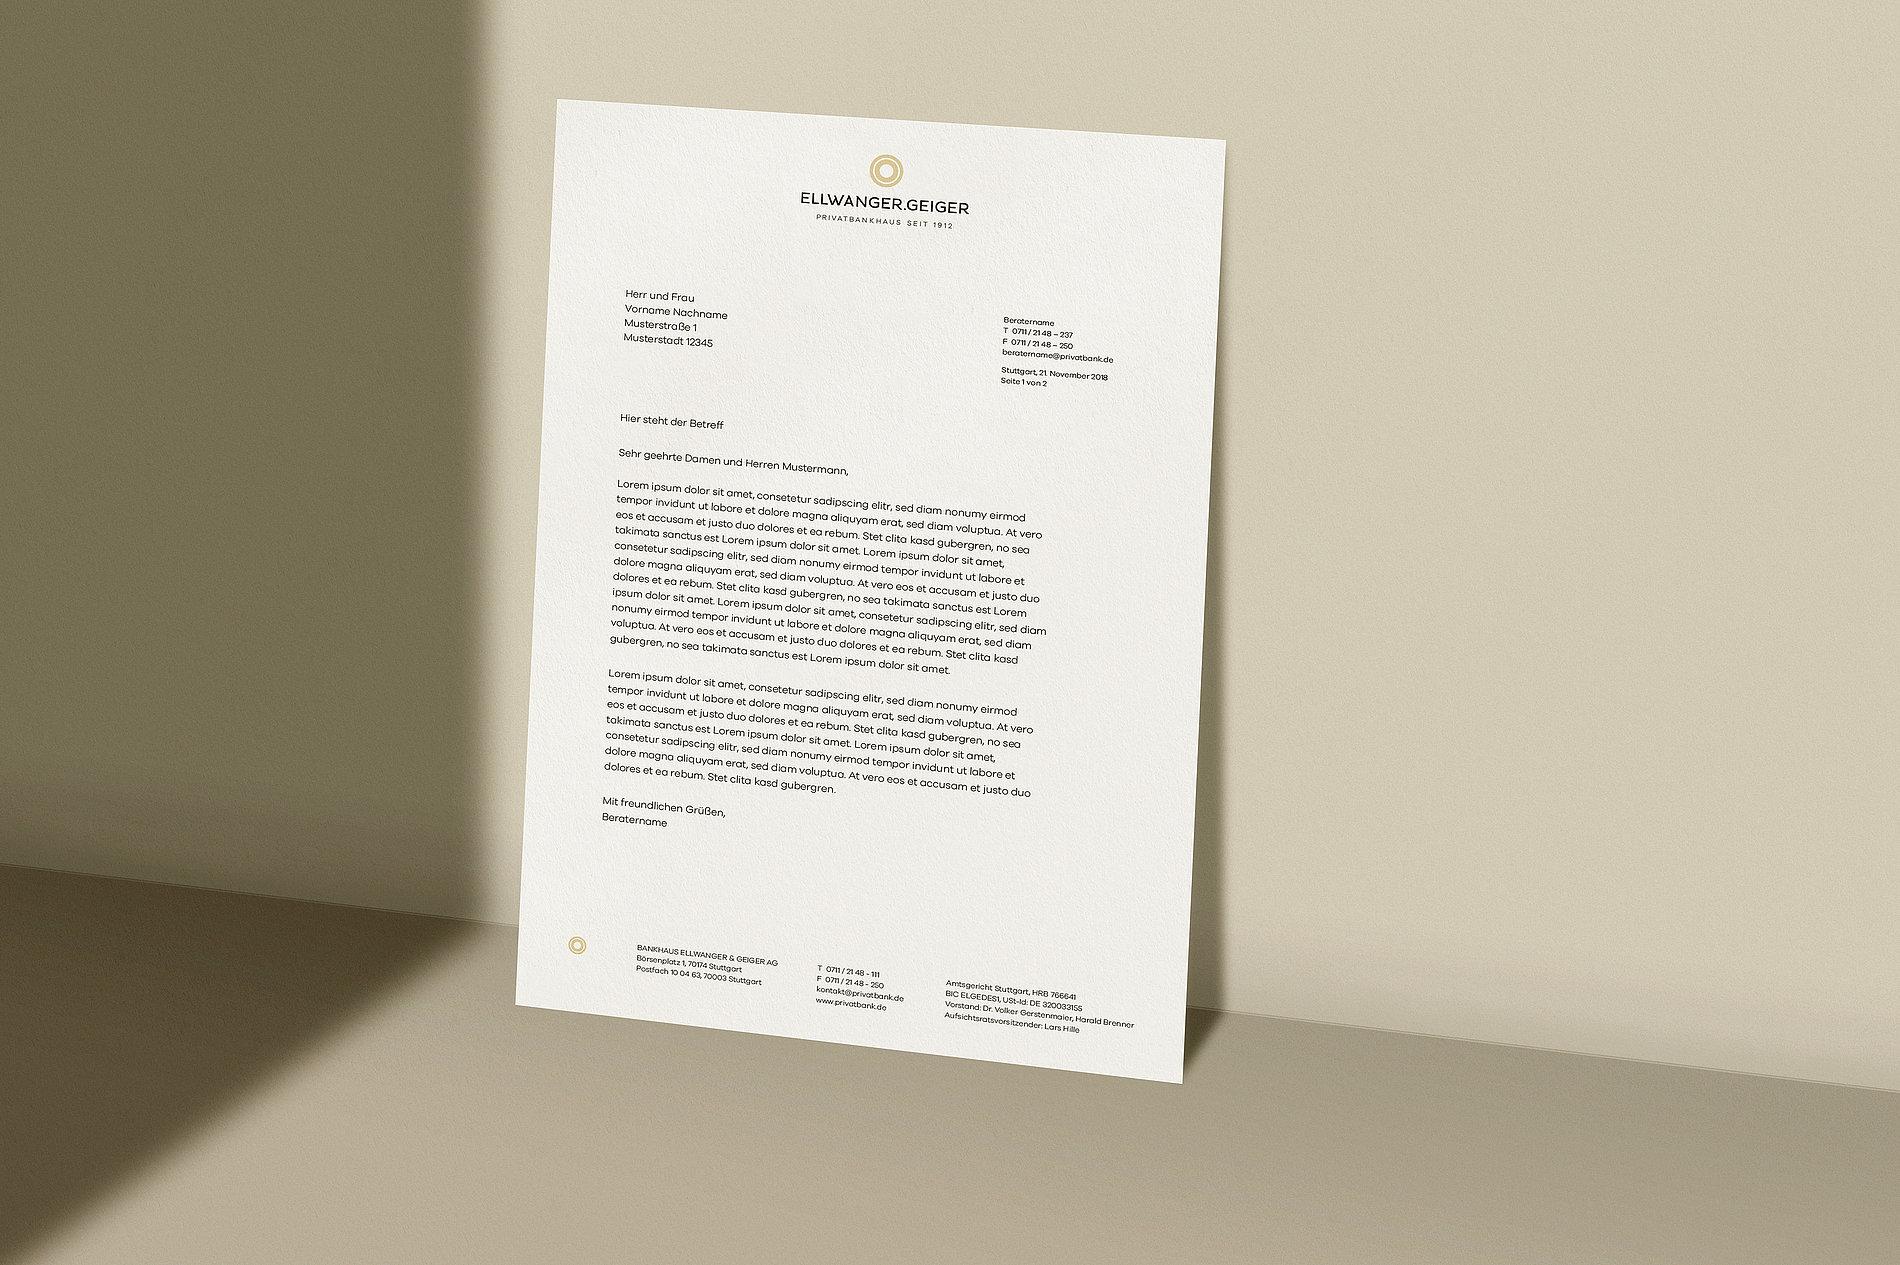 ELLWANGER.GEIGER | Red Dot Design Award